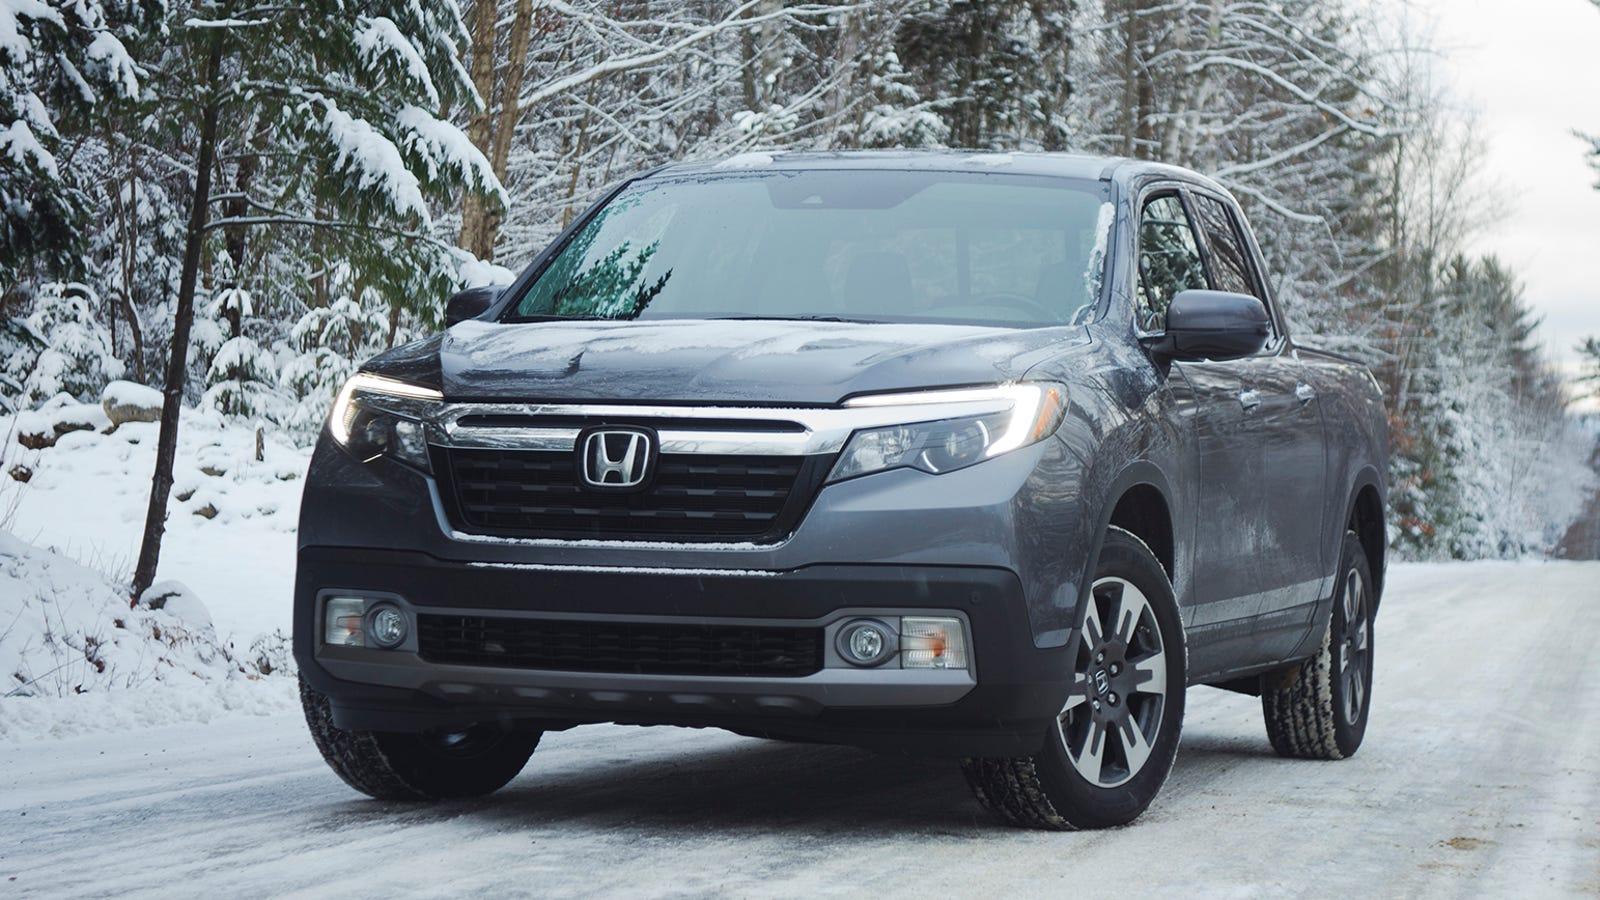 Image Result For Honda Ridgeline In Snow